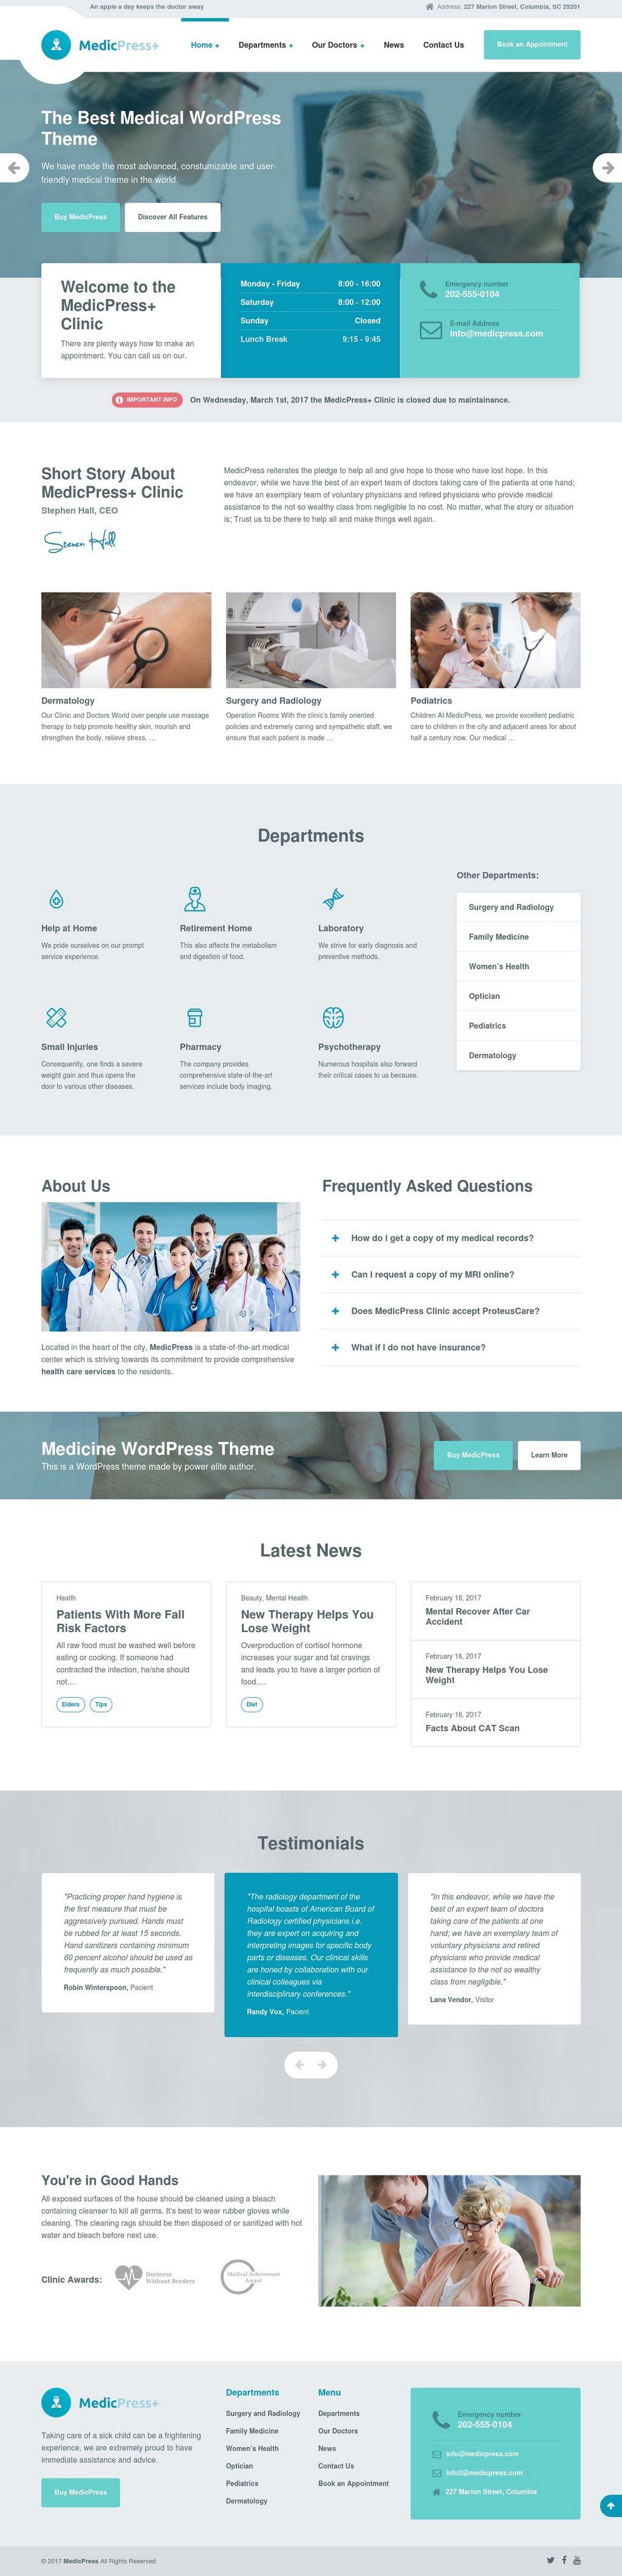 medicpress proteusthemes wordpress theme 01 - medicpress-proteusthemes-wordpress-theme-01